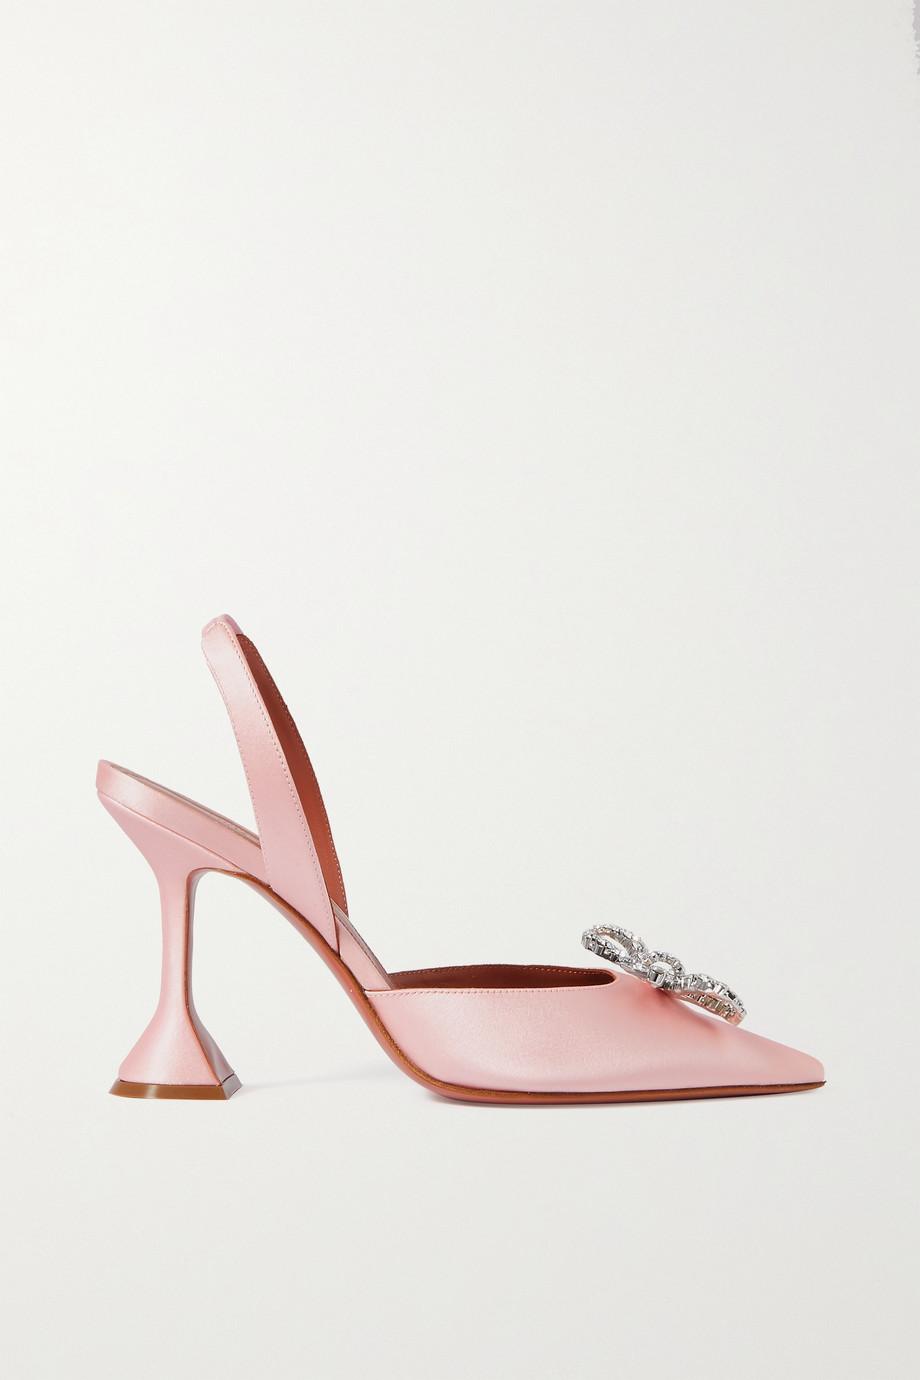 Amina Muaddi Rosie crystal-embellished satin slingback pumps